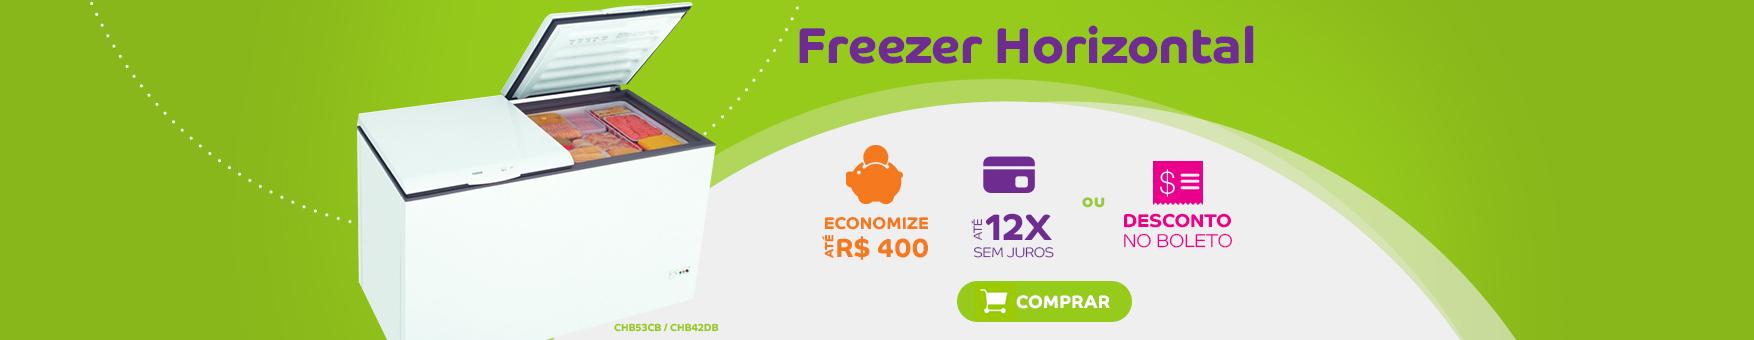 Promoção Interna - 105 - categoria_freezerhorizontal_home_1071015 - freezerhorizontal - 1